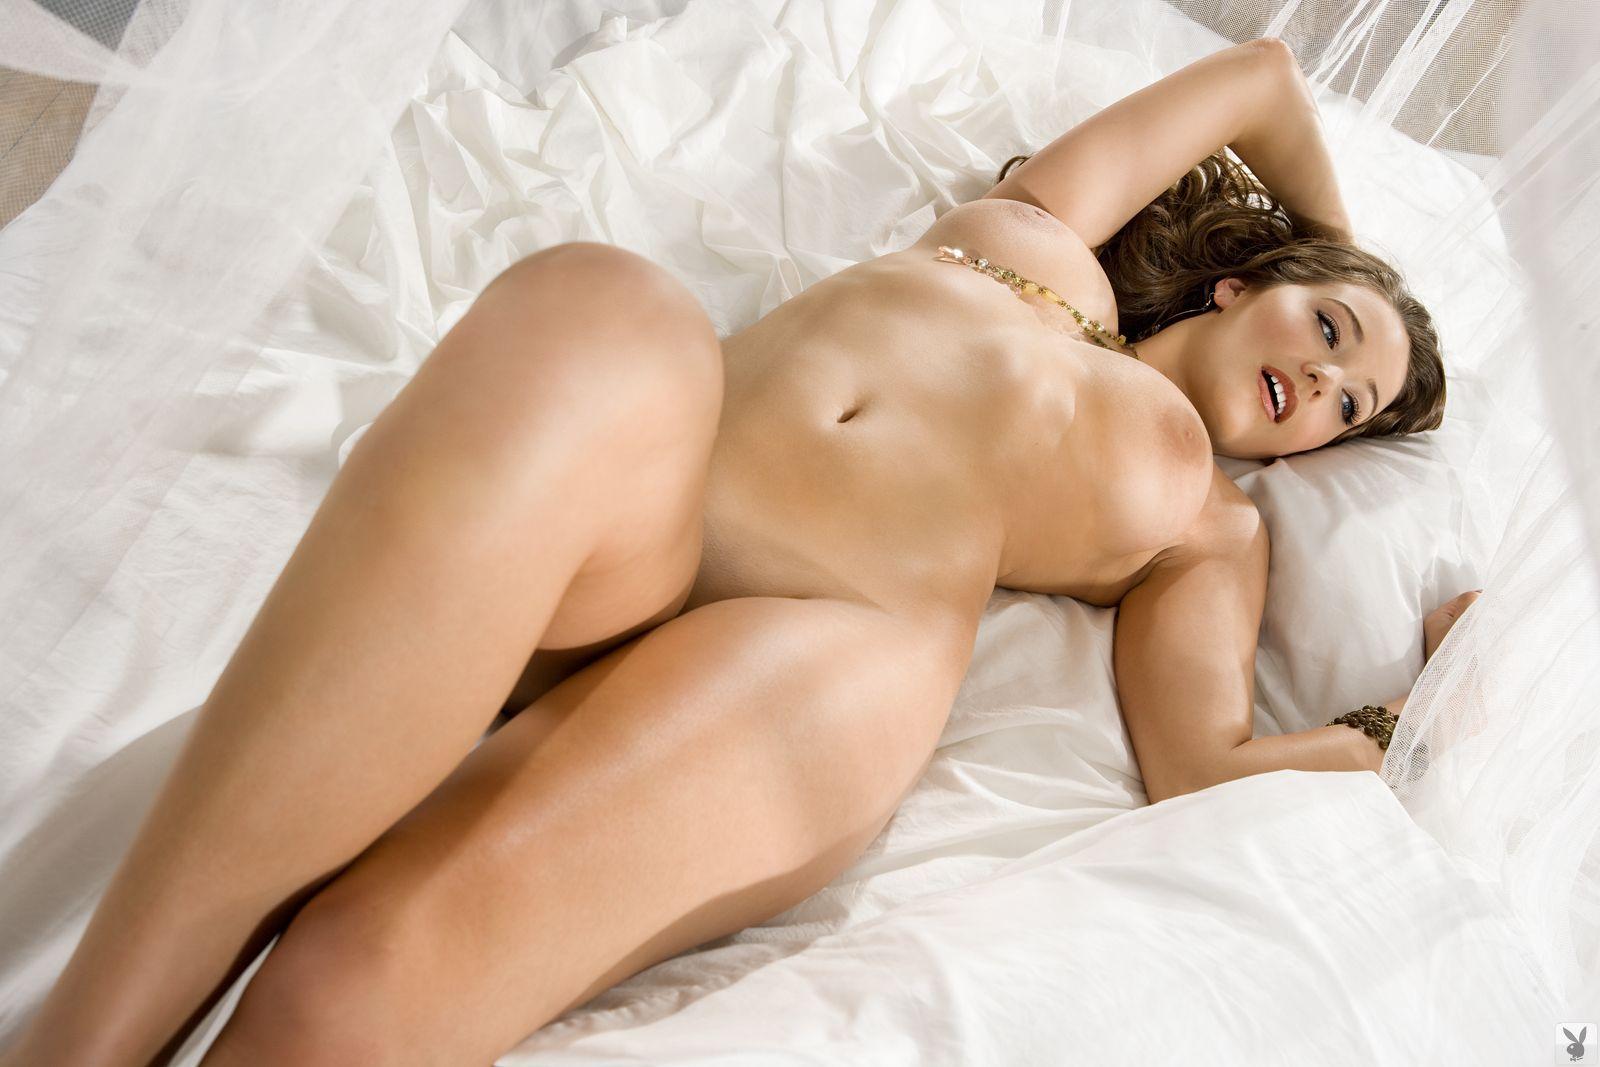 Фигуристая голая женщина 1